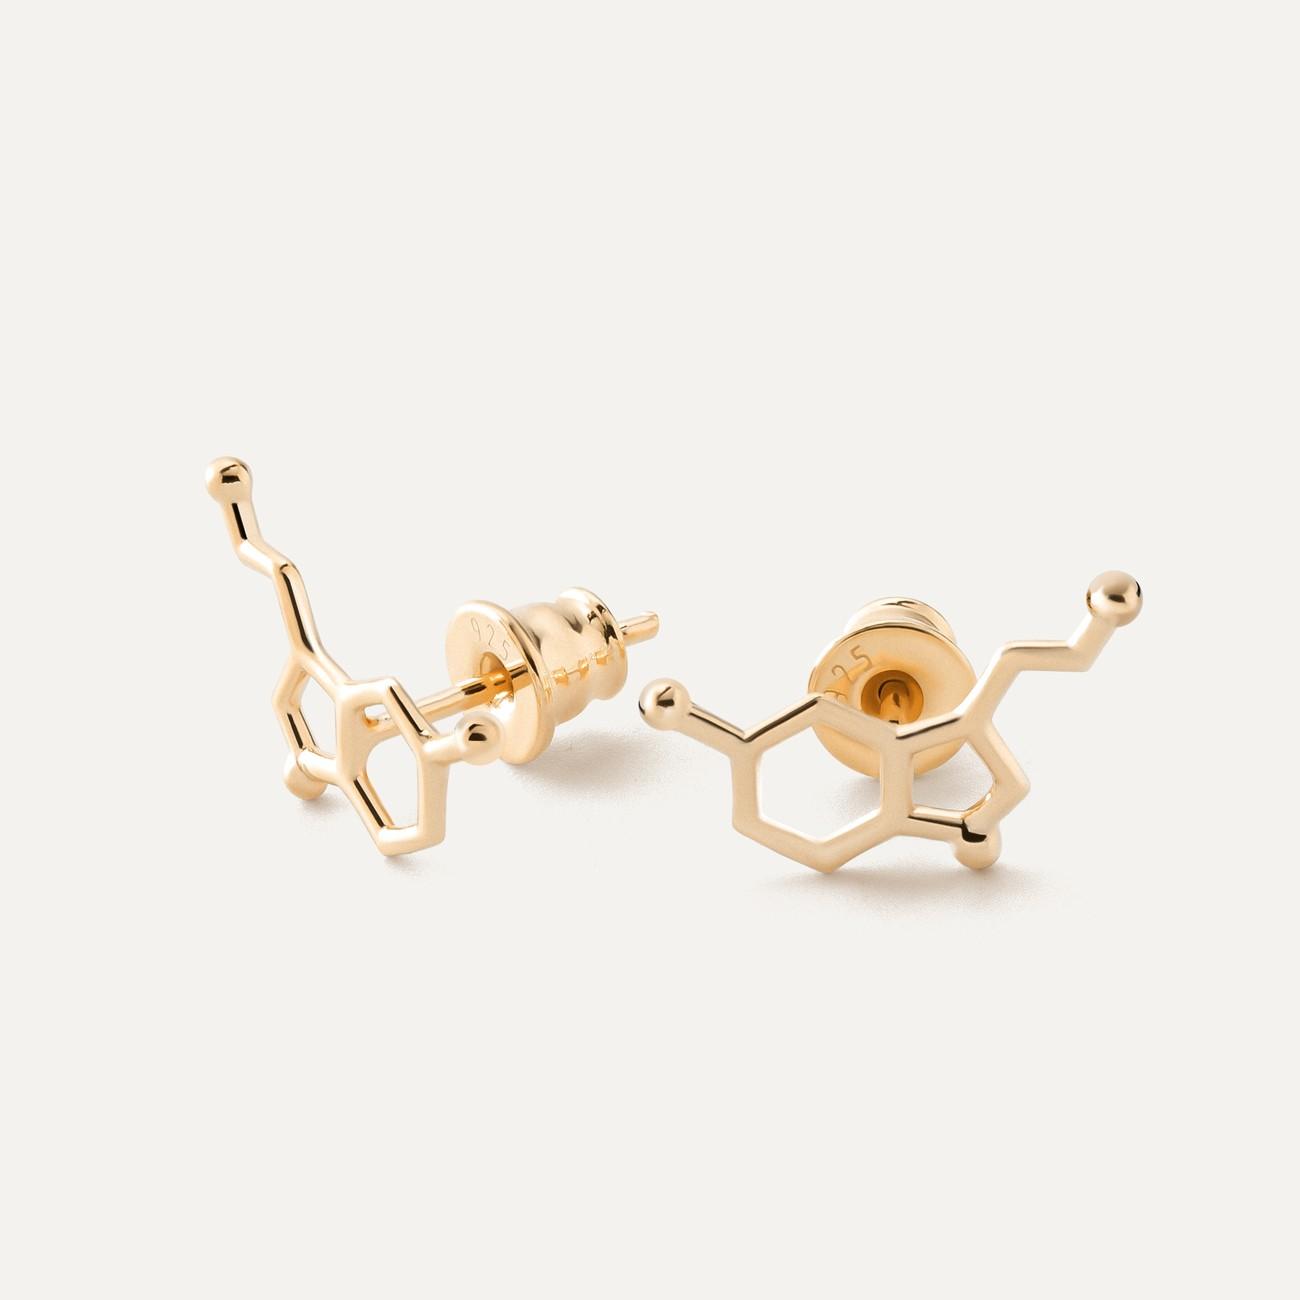 Earrings serotonin chemical formula, sterling silver